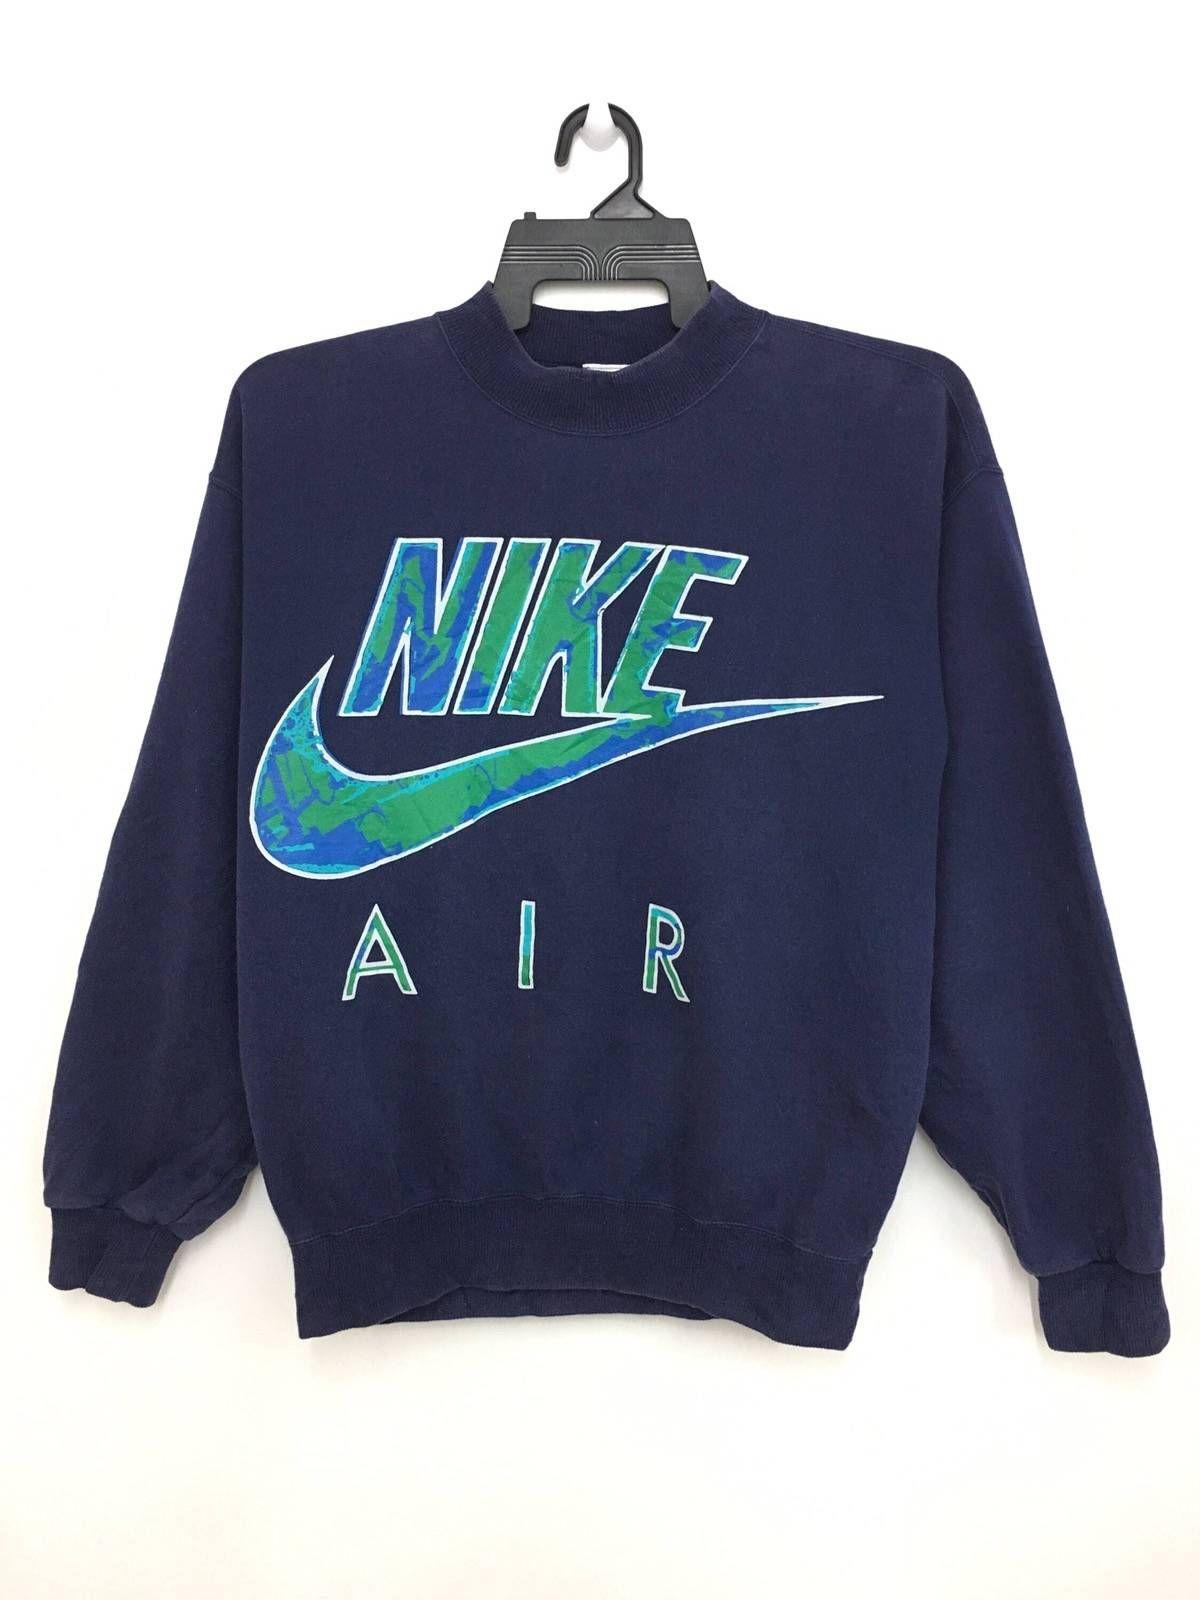 14b616af4 Nike Vintage 90 s NIKE AIR Sweatshirt Jumper Big Logo Spellout Grey Tag  Nice Design Large Size On Tag Size m - Sweatshirts   Hoodies for Sale -  Grailed